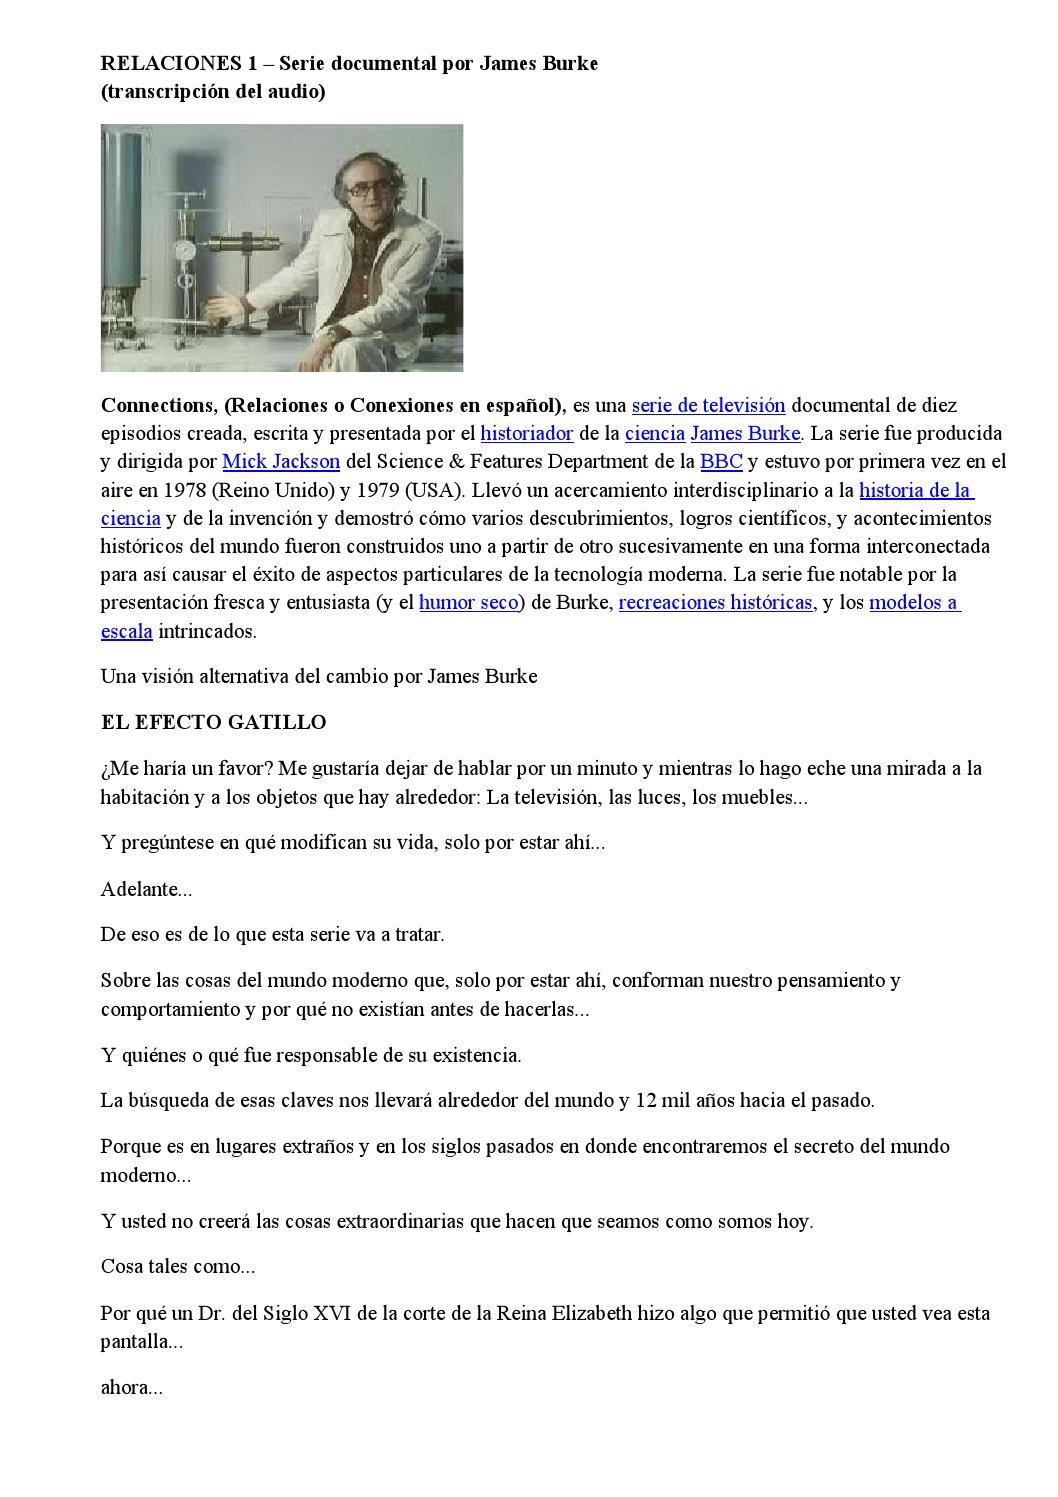 Relaciones 1 – serie documental por james burke by Jorge Arabito - issuu